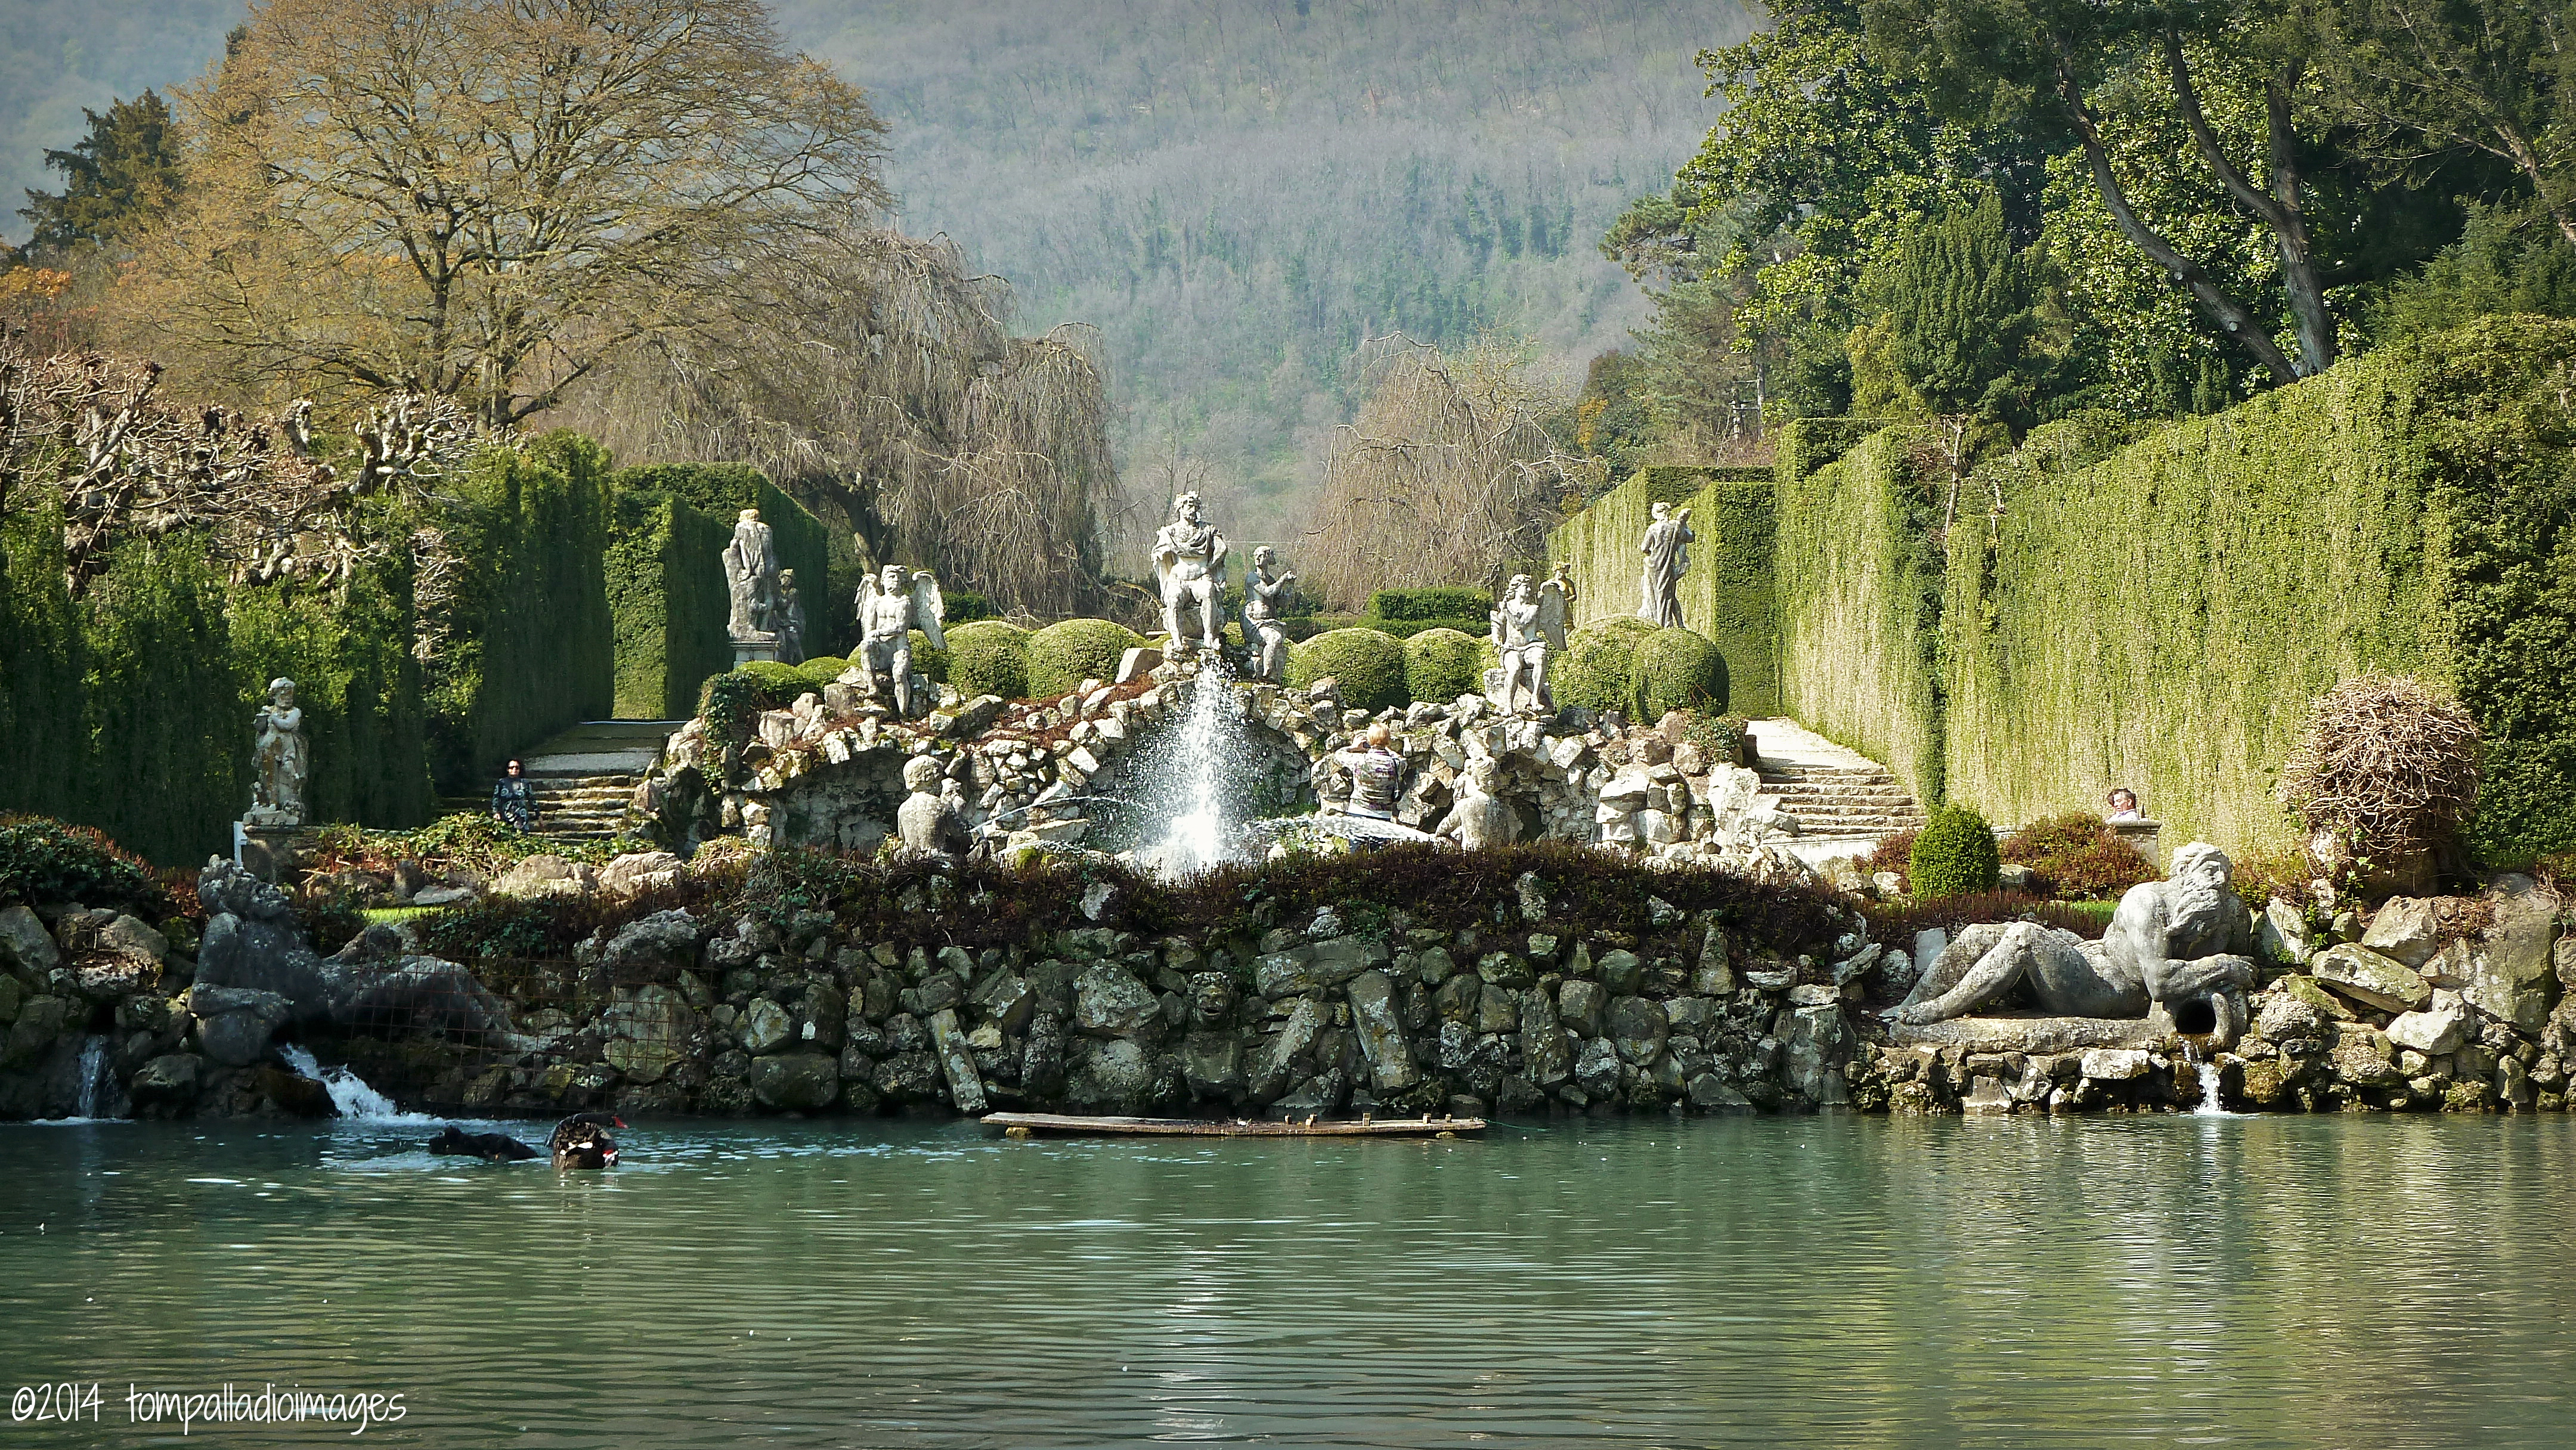 Awesome The Villas Of The Venetian Republic: Villa Barbarigo Garden   ©2014 Tom  Palladio Images